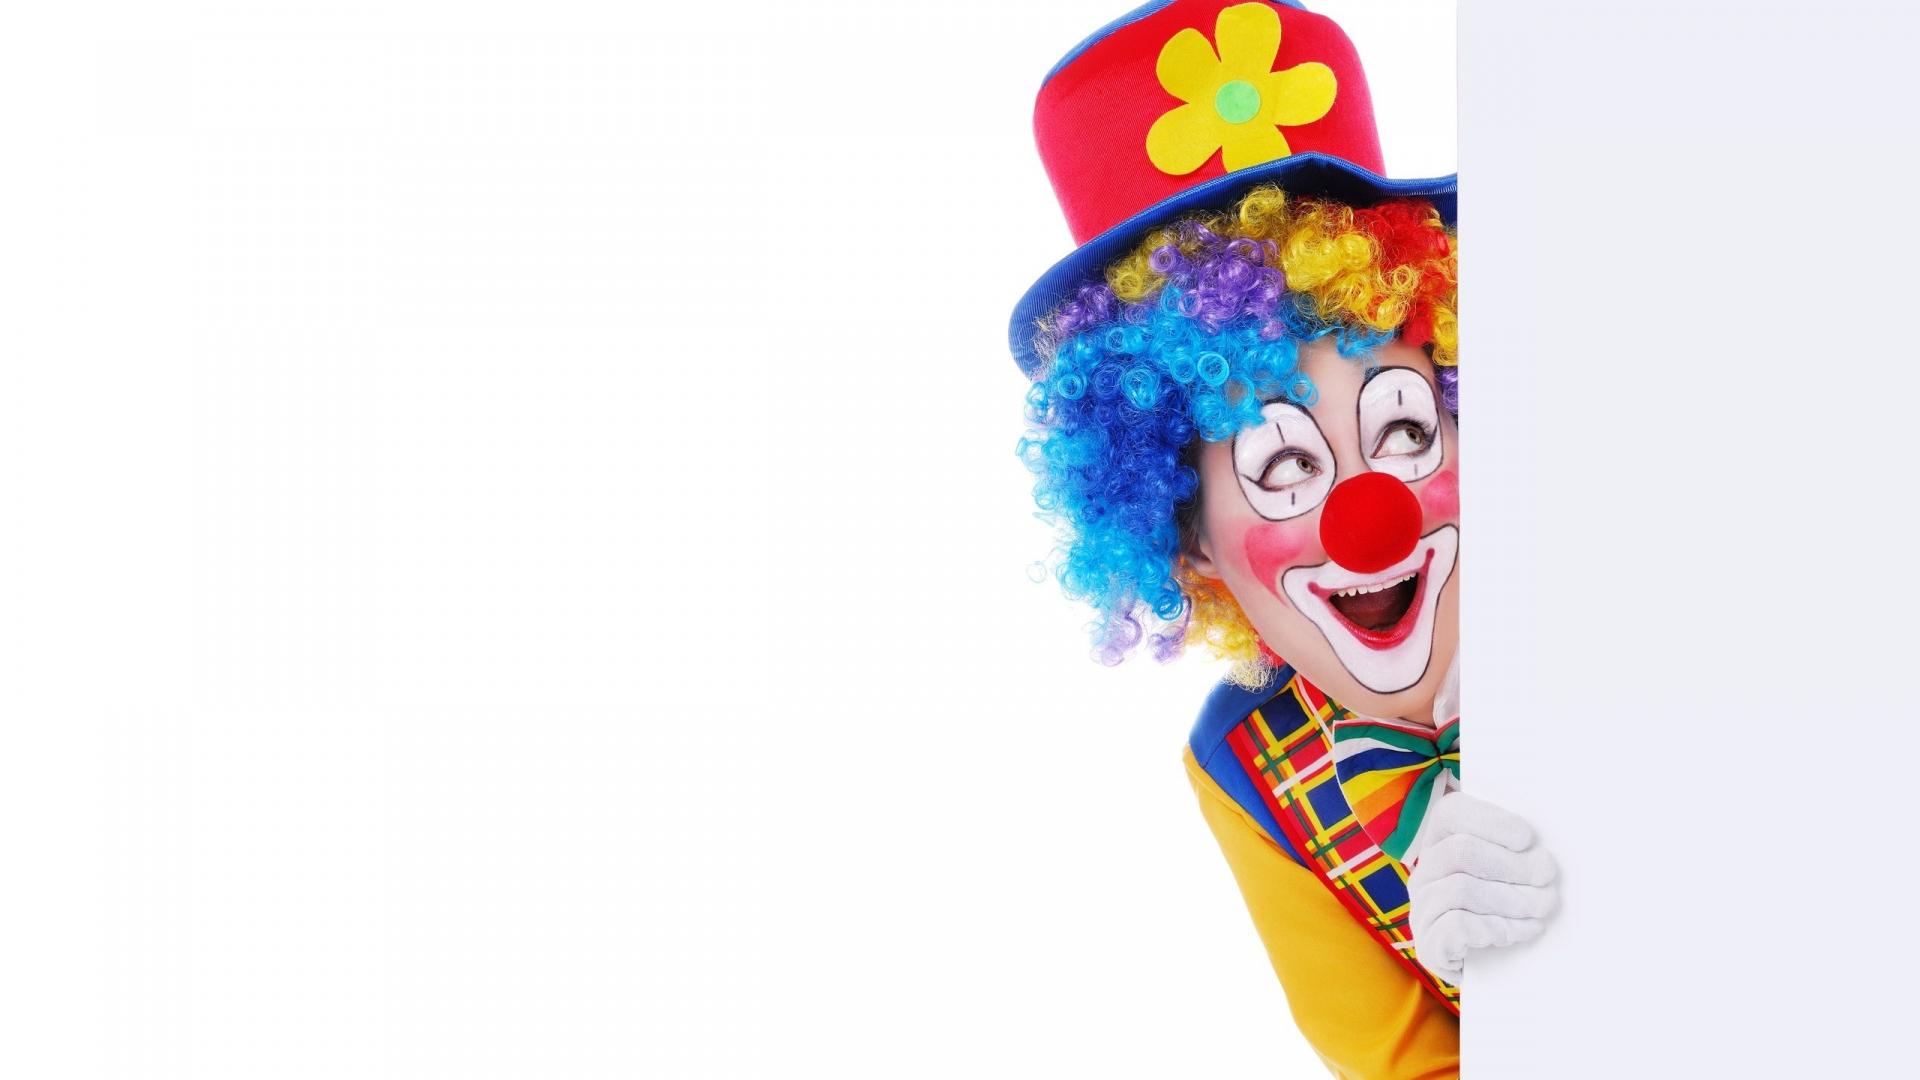 Free Download Colorful Clown Funny Smile White Wooden Board dedans Etoil Clown